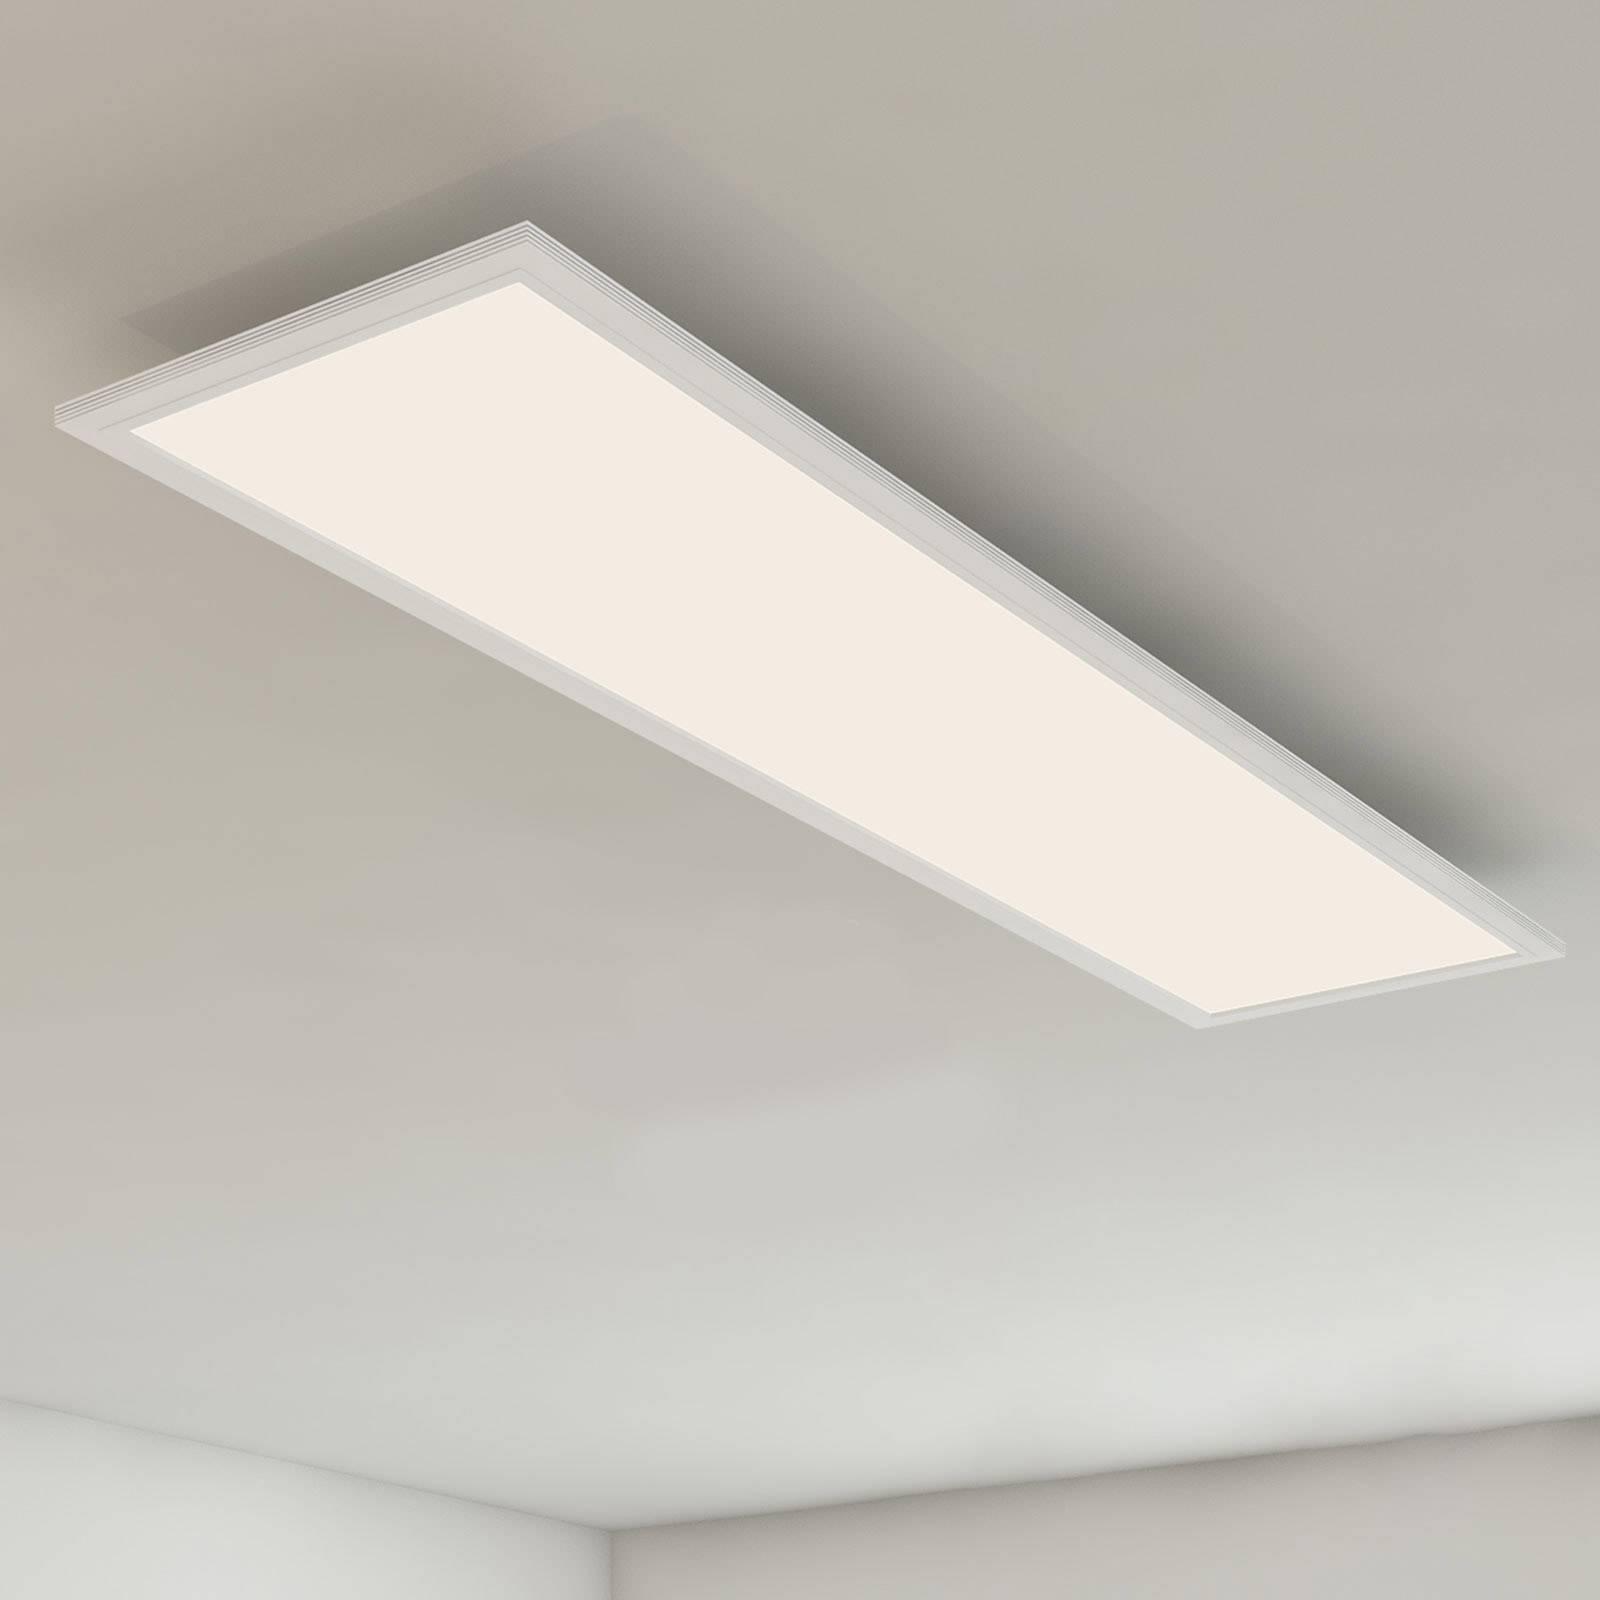 LED-paneeli 7189-016, anturi 119,5 x 29,5 cm